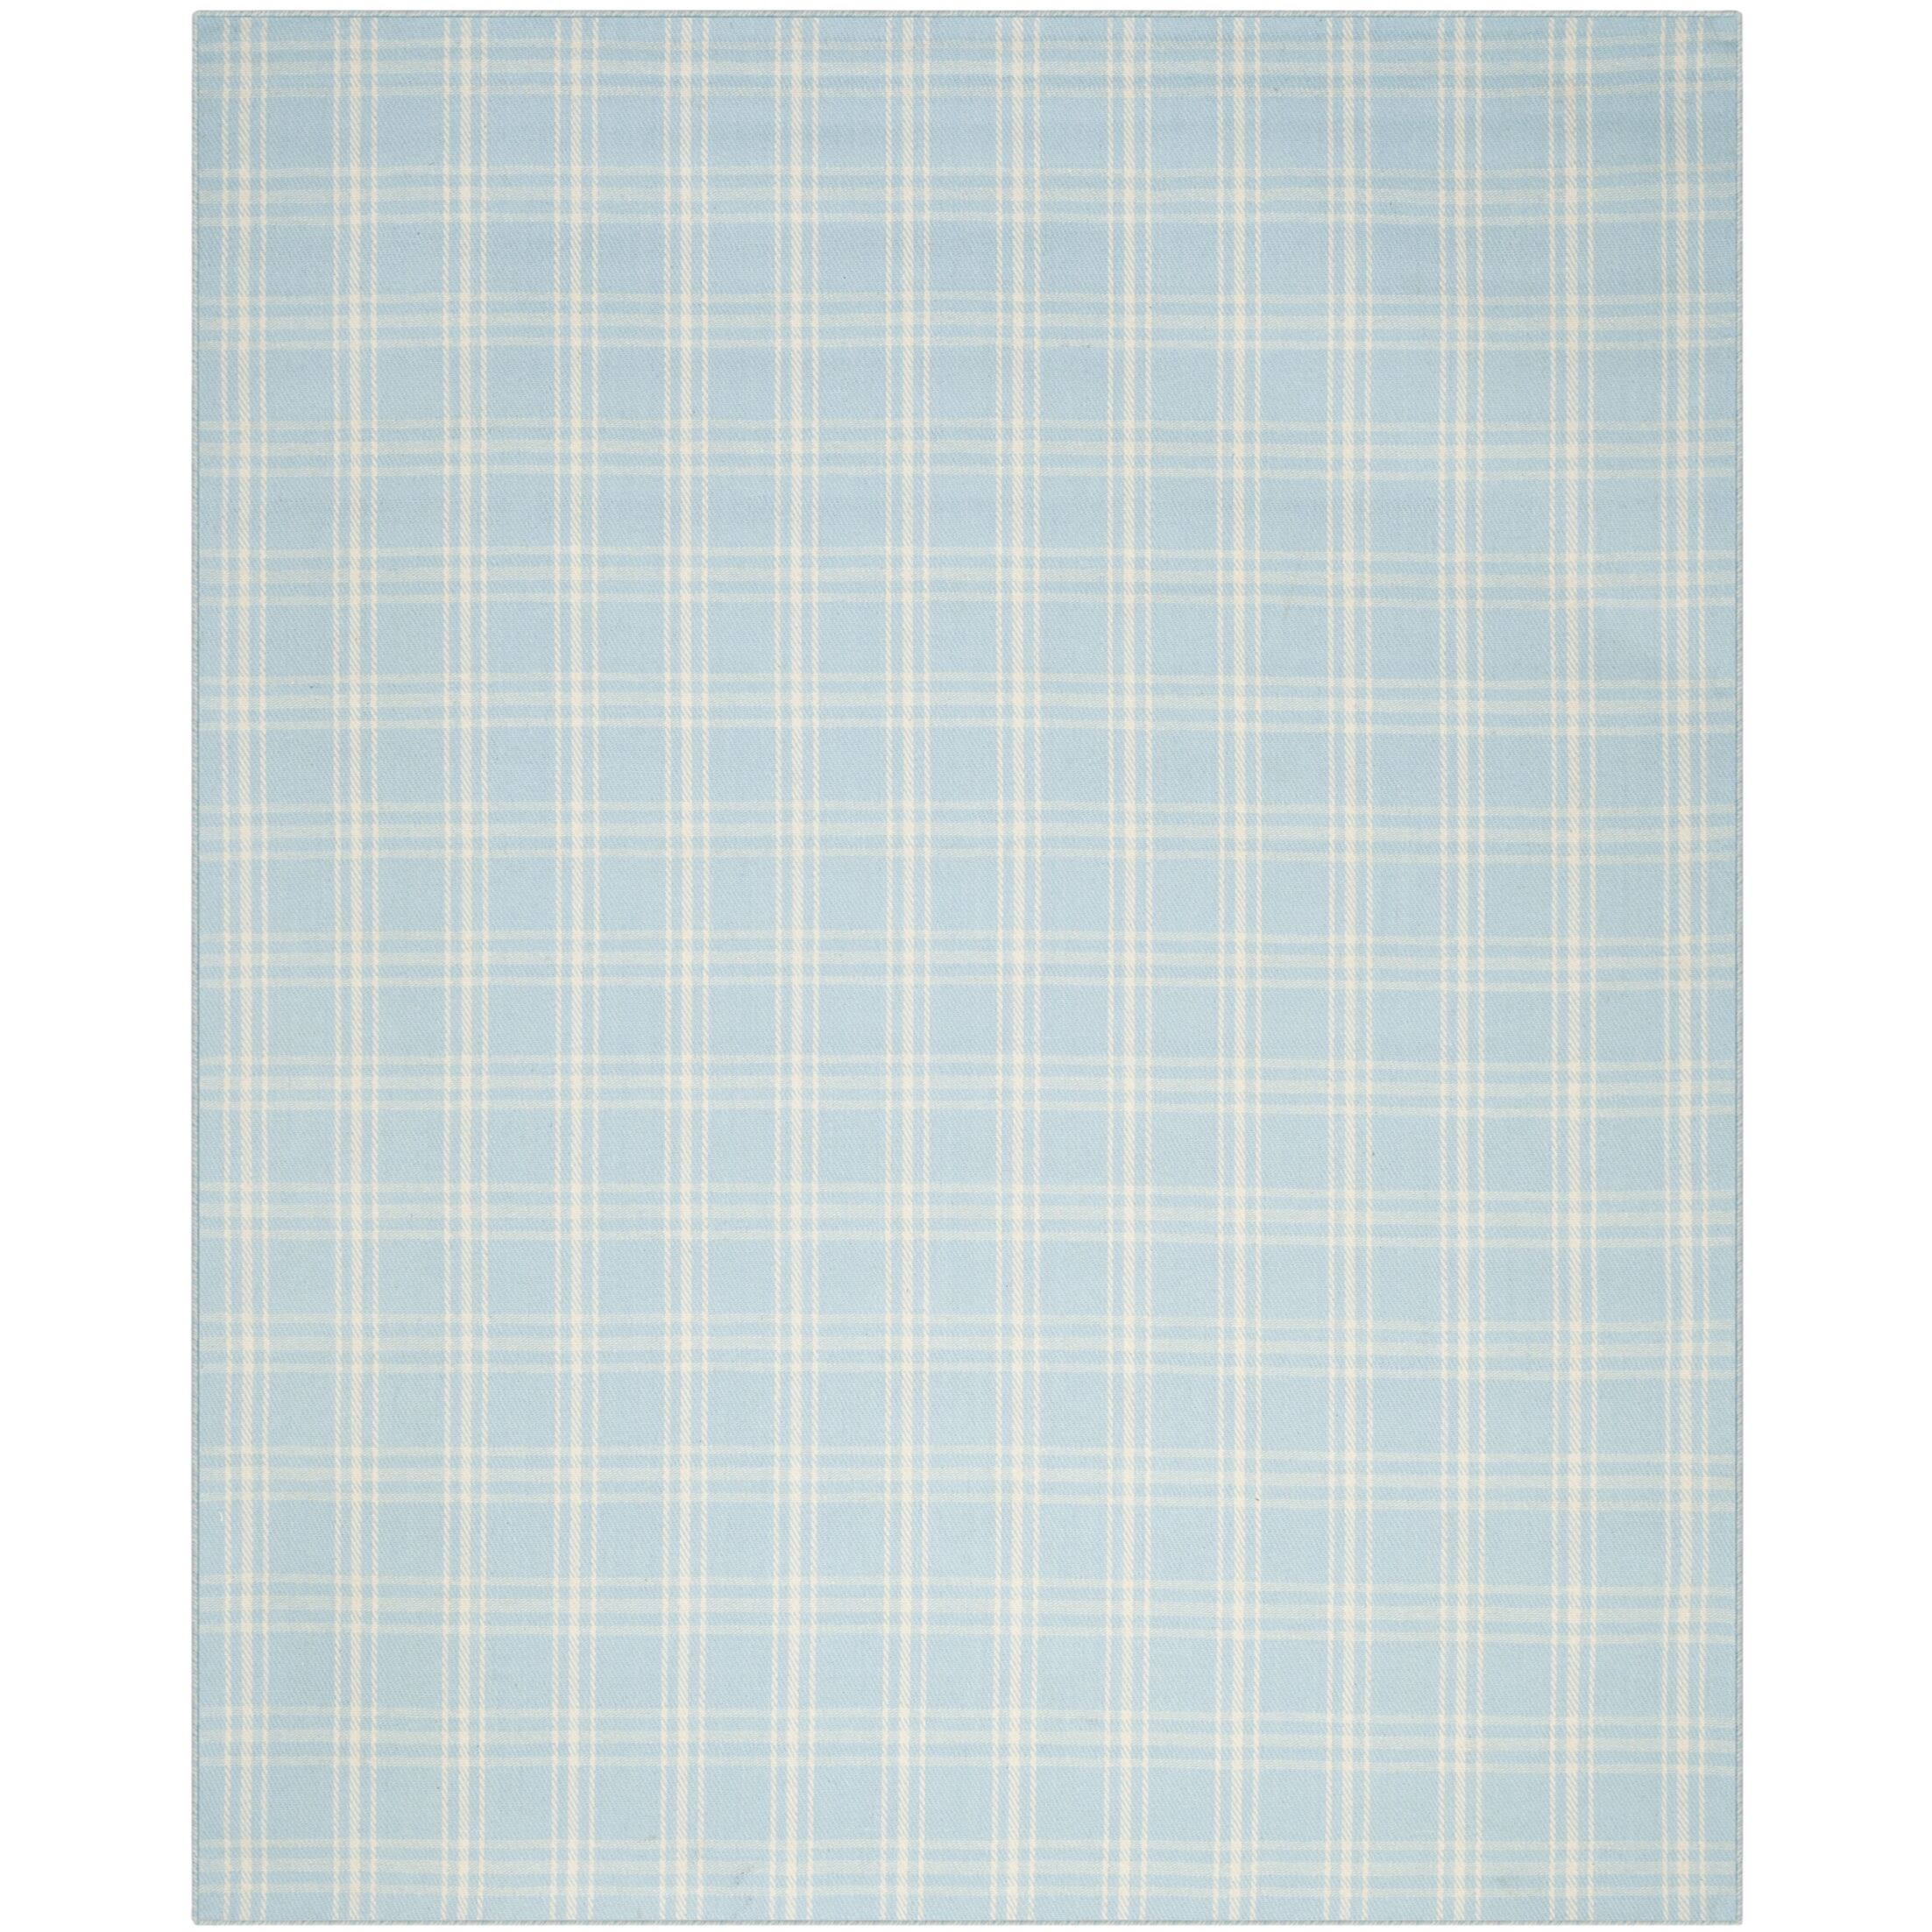 Kilim Light Blue / Beige Tribal Rug Rug Size: Rectangle 8' x 10'